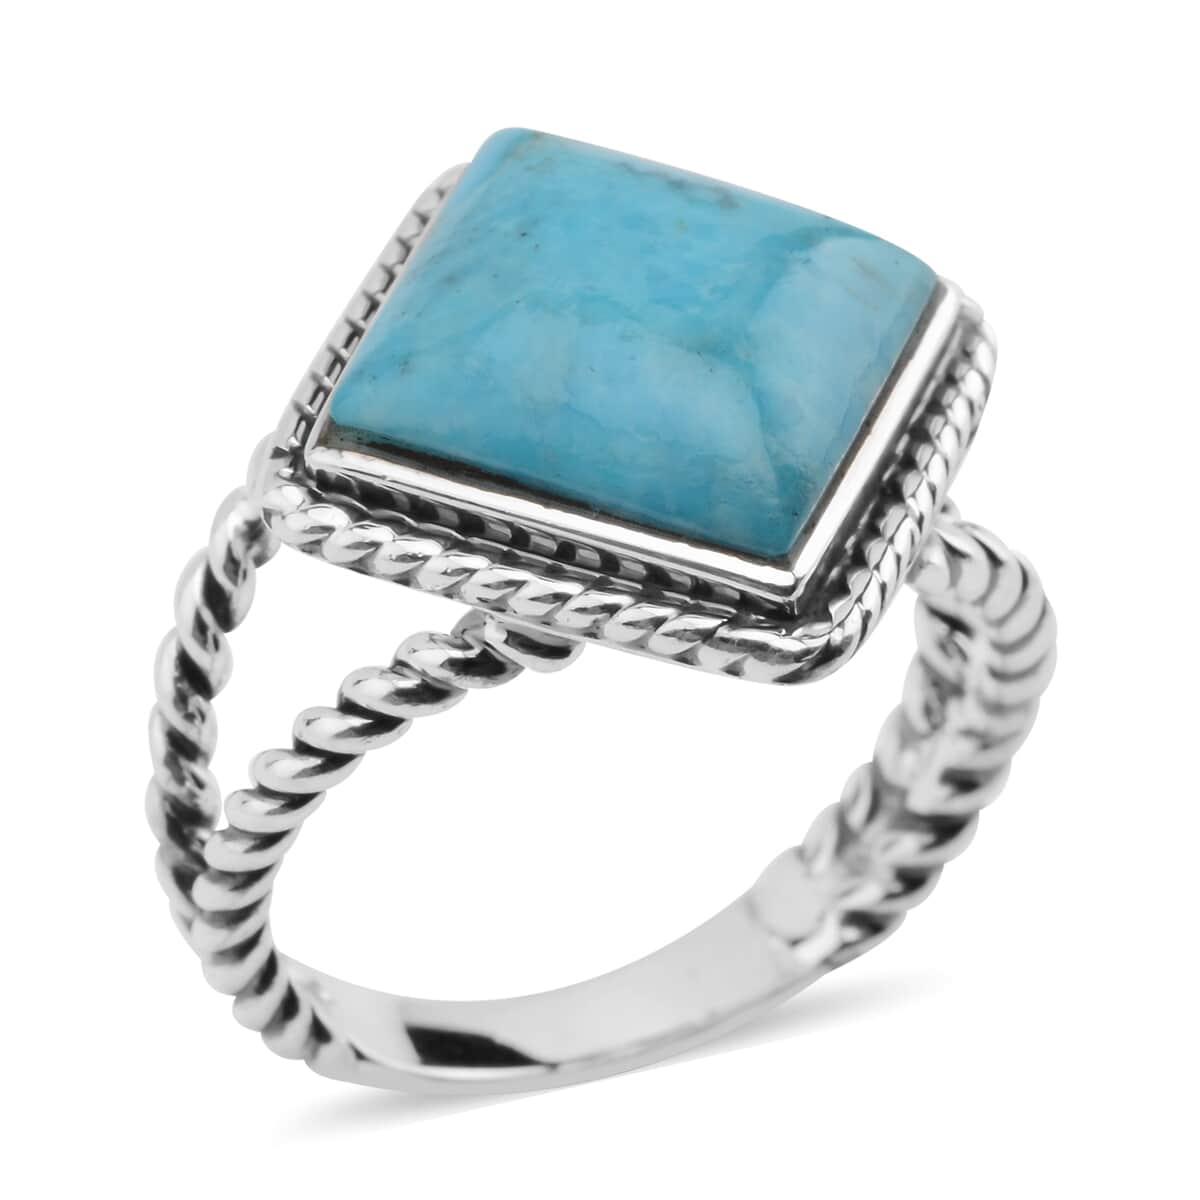 Santa Fe Style Kingman Turquoise Split Ring in Sterling Silver (Size 10.0) 4.00 ctw